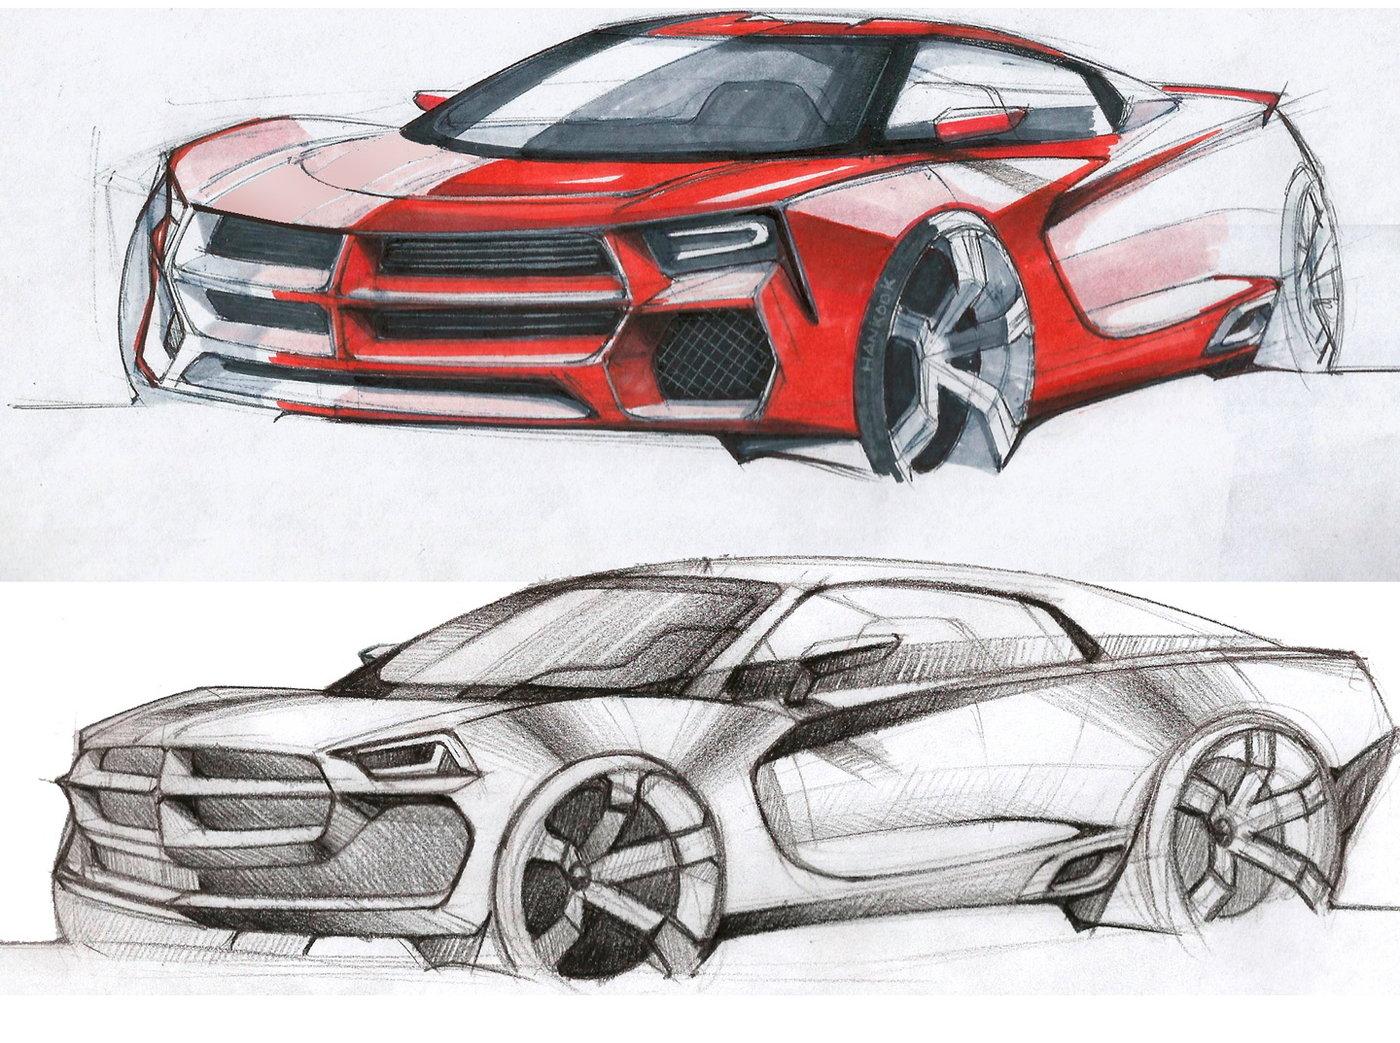 Car Design Sketch By Daniel Chinchilla At Coroflot Com